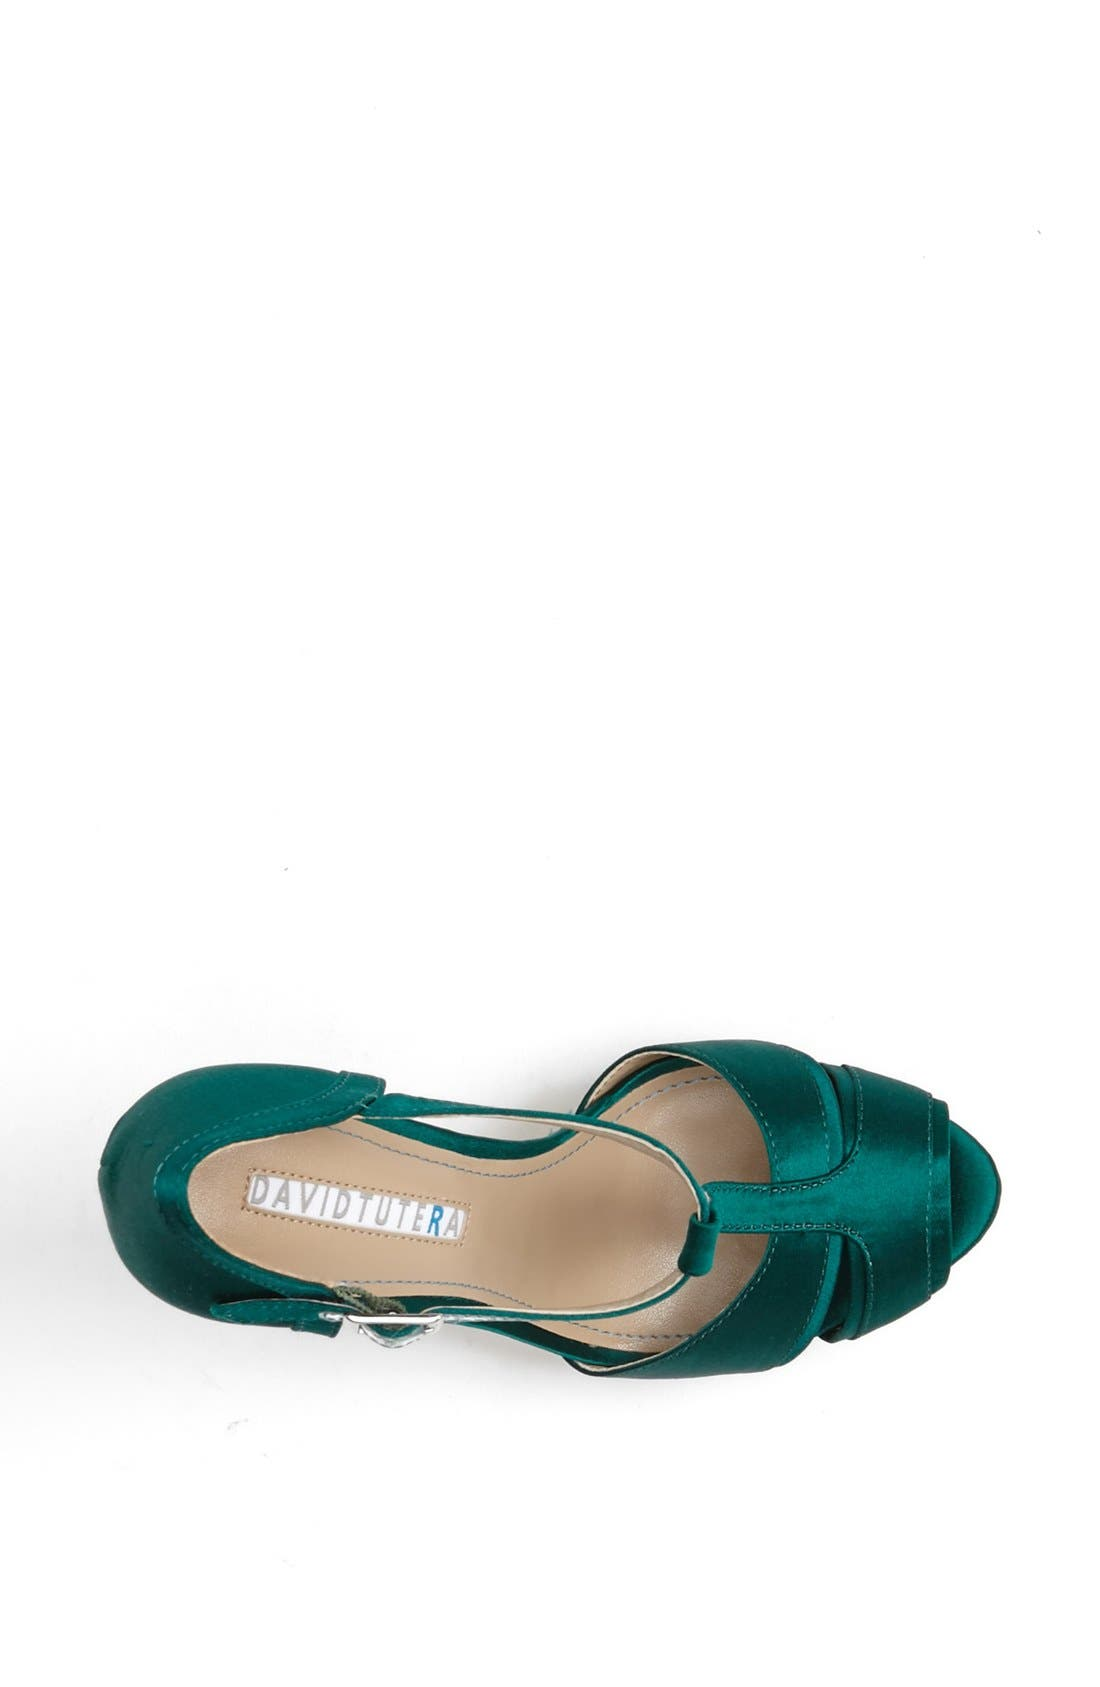 Alternate Image 3  - David Tutera 'Joy' Sandal (Online Only Color)